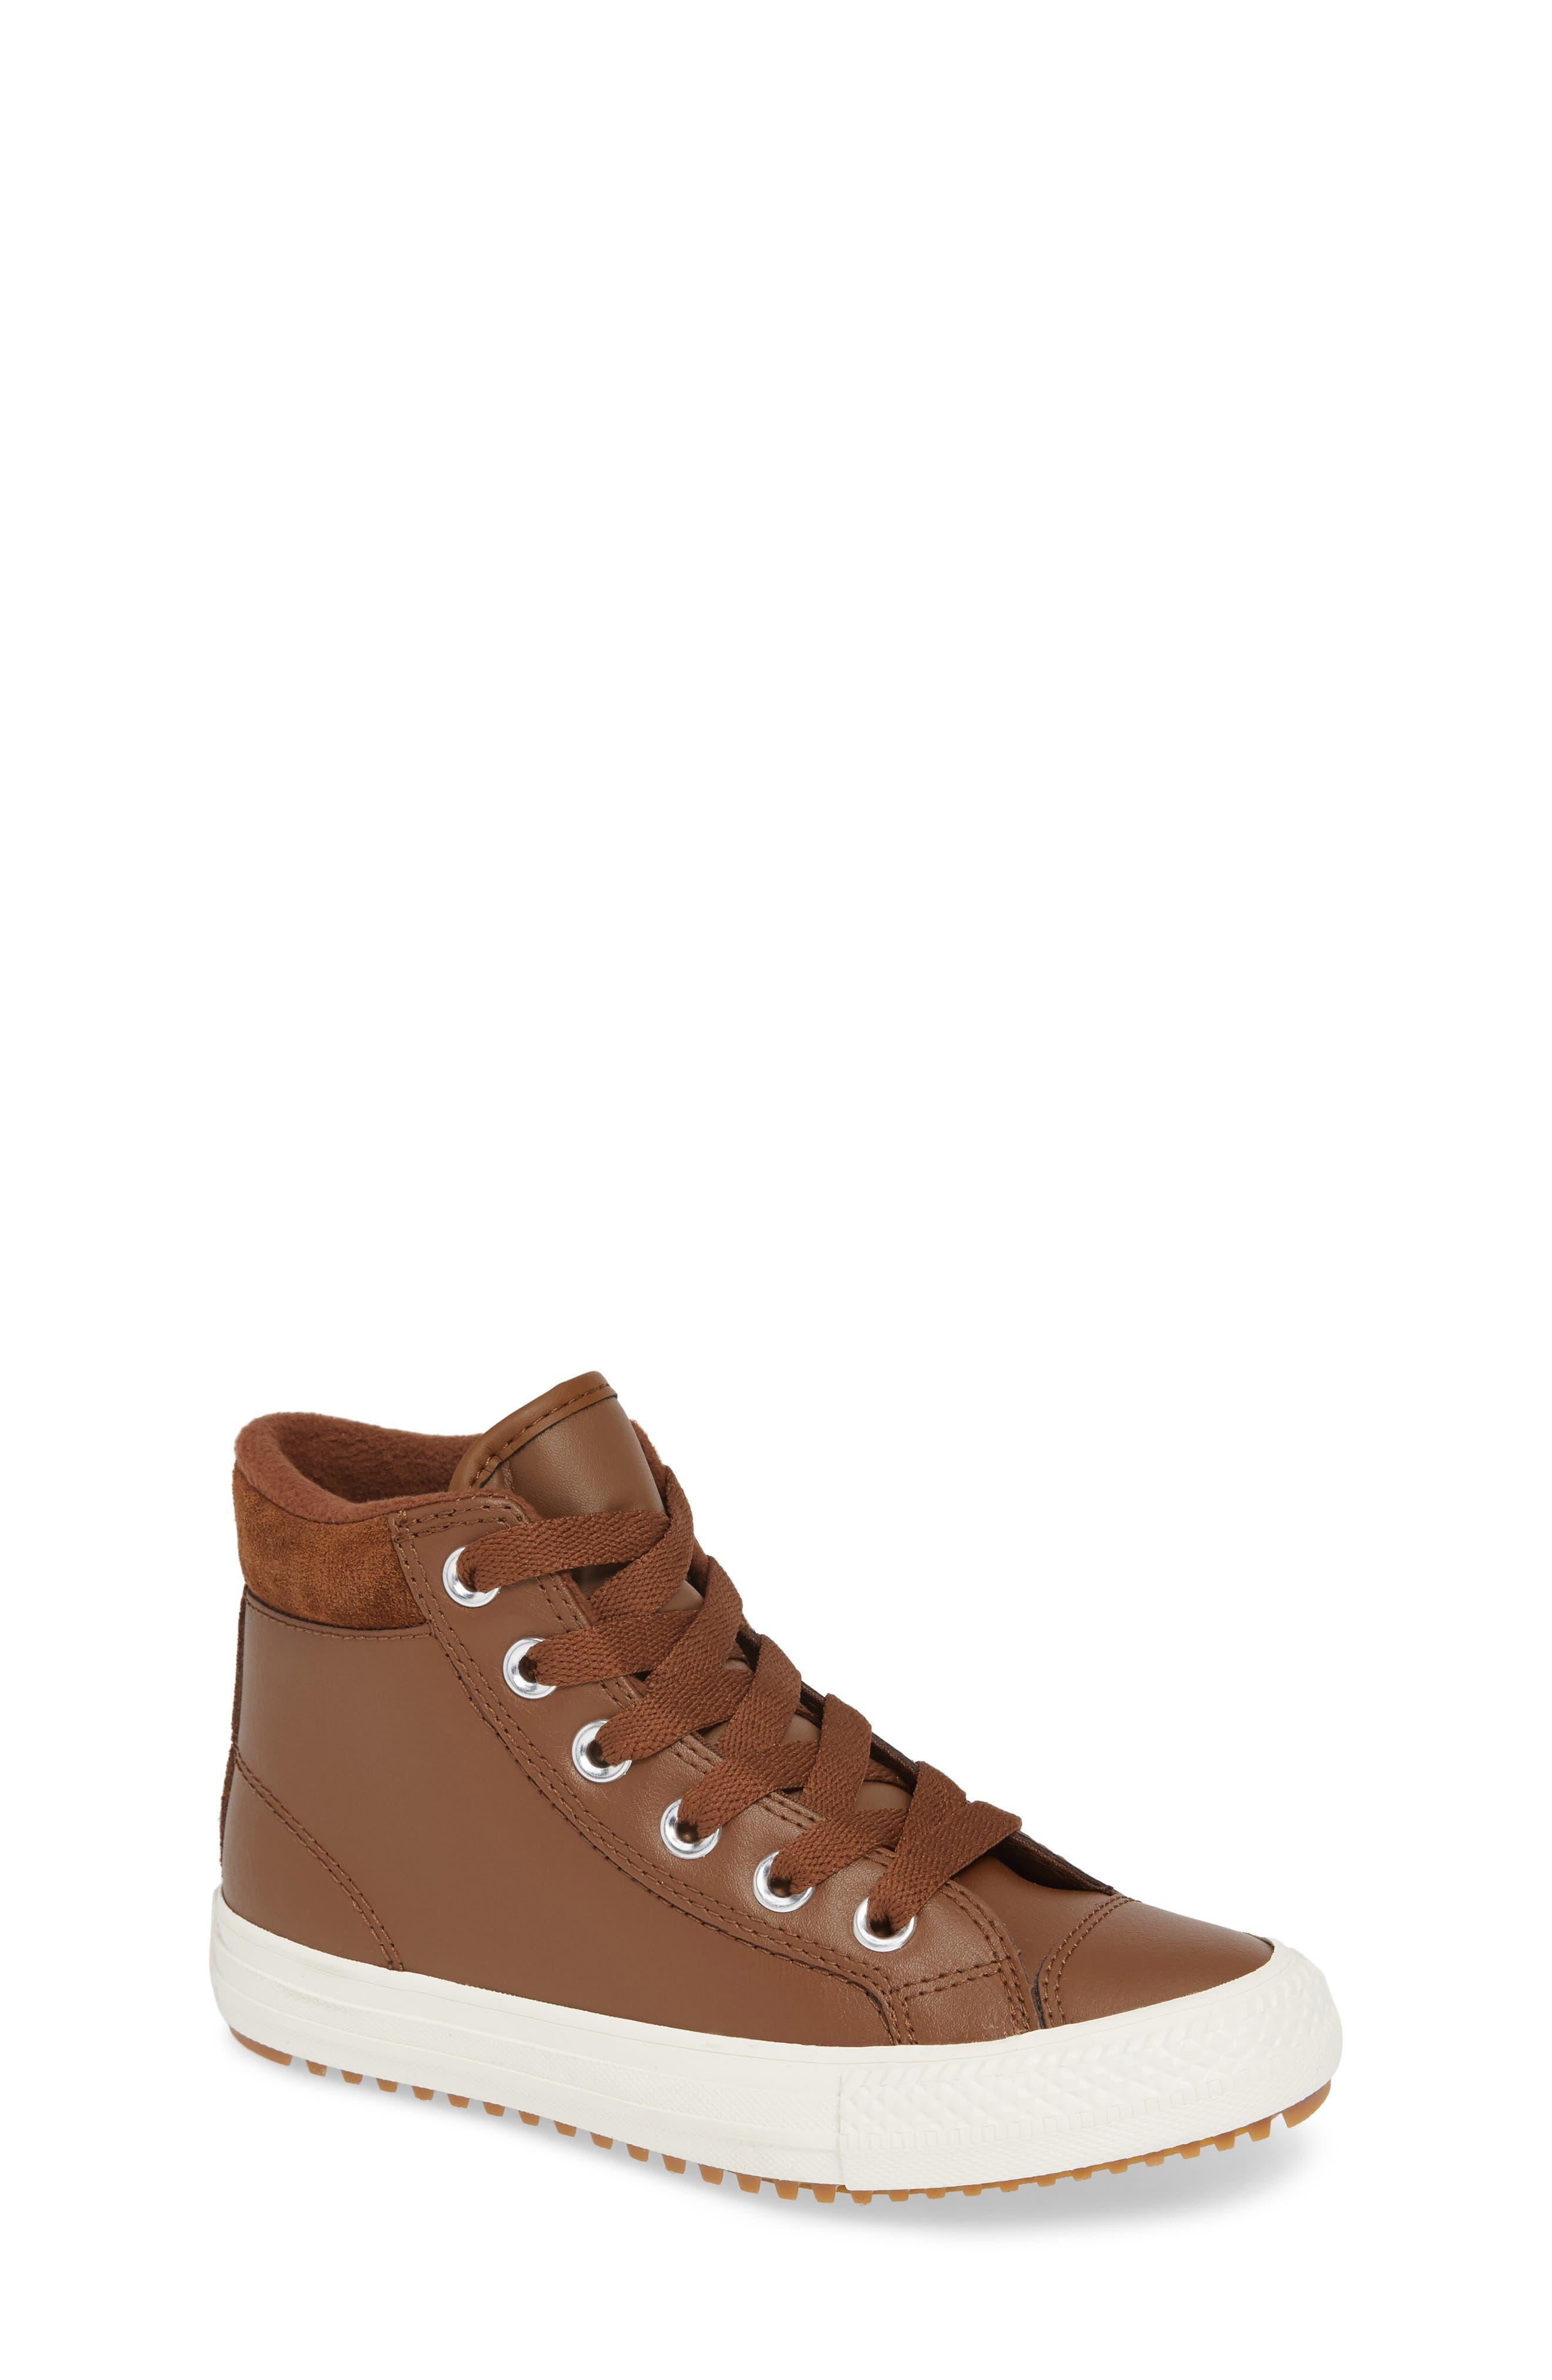 Boys Converse Chuck Taylor All Star Pc High Top Sneaker